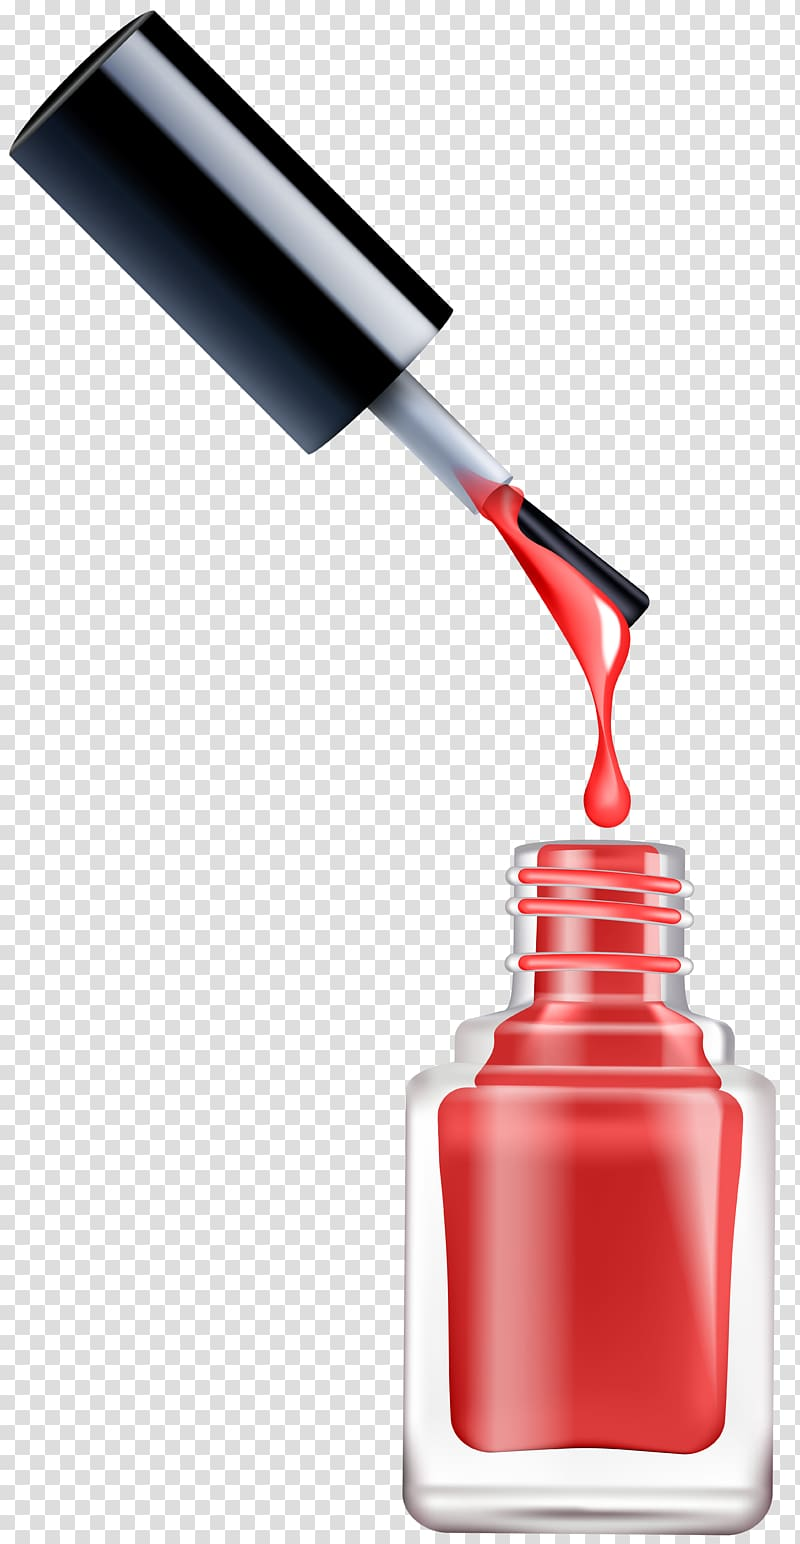 Red nail polisher bottle, Cosmetics Nail Polish , pedicure.